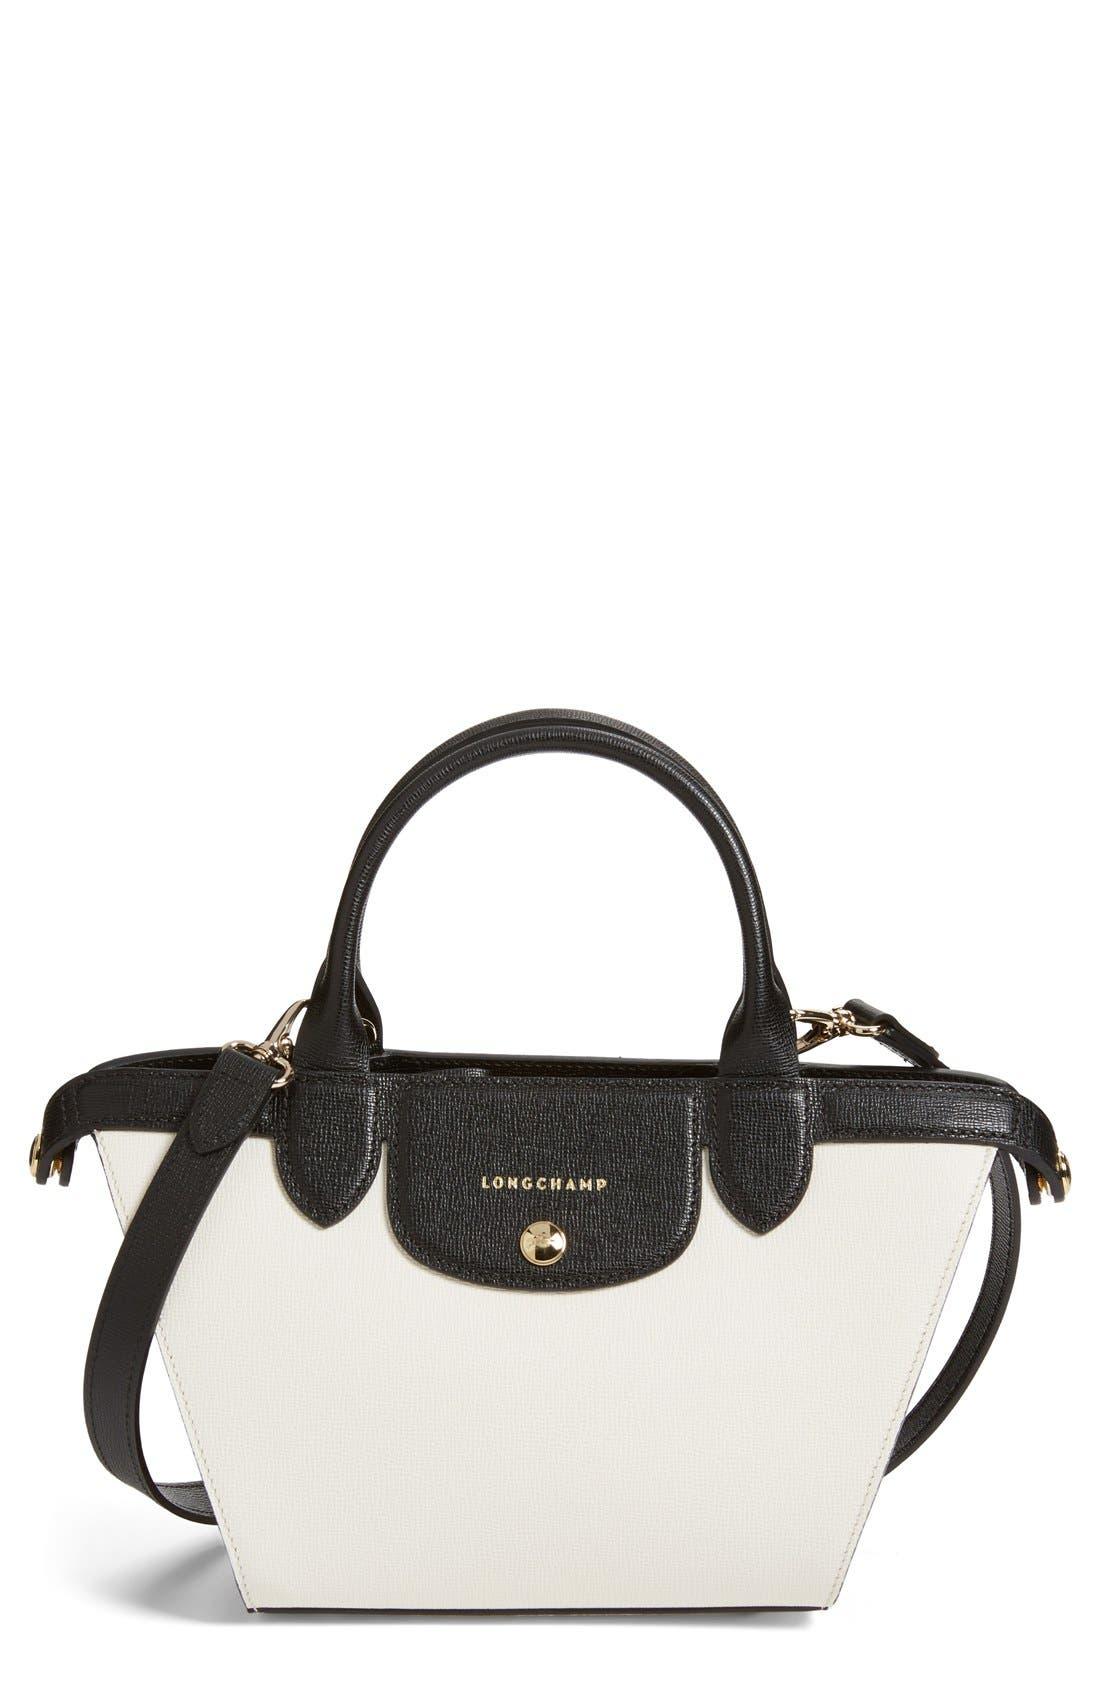 'Small Le Pliage - Heritage' Leather Handbag,                             Main thumbnail 1, color,                             100